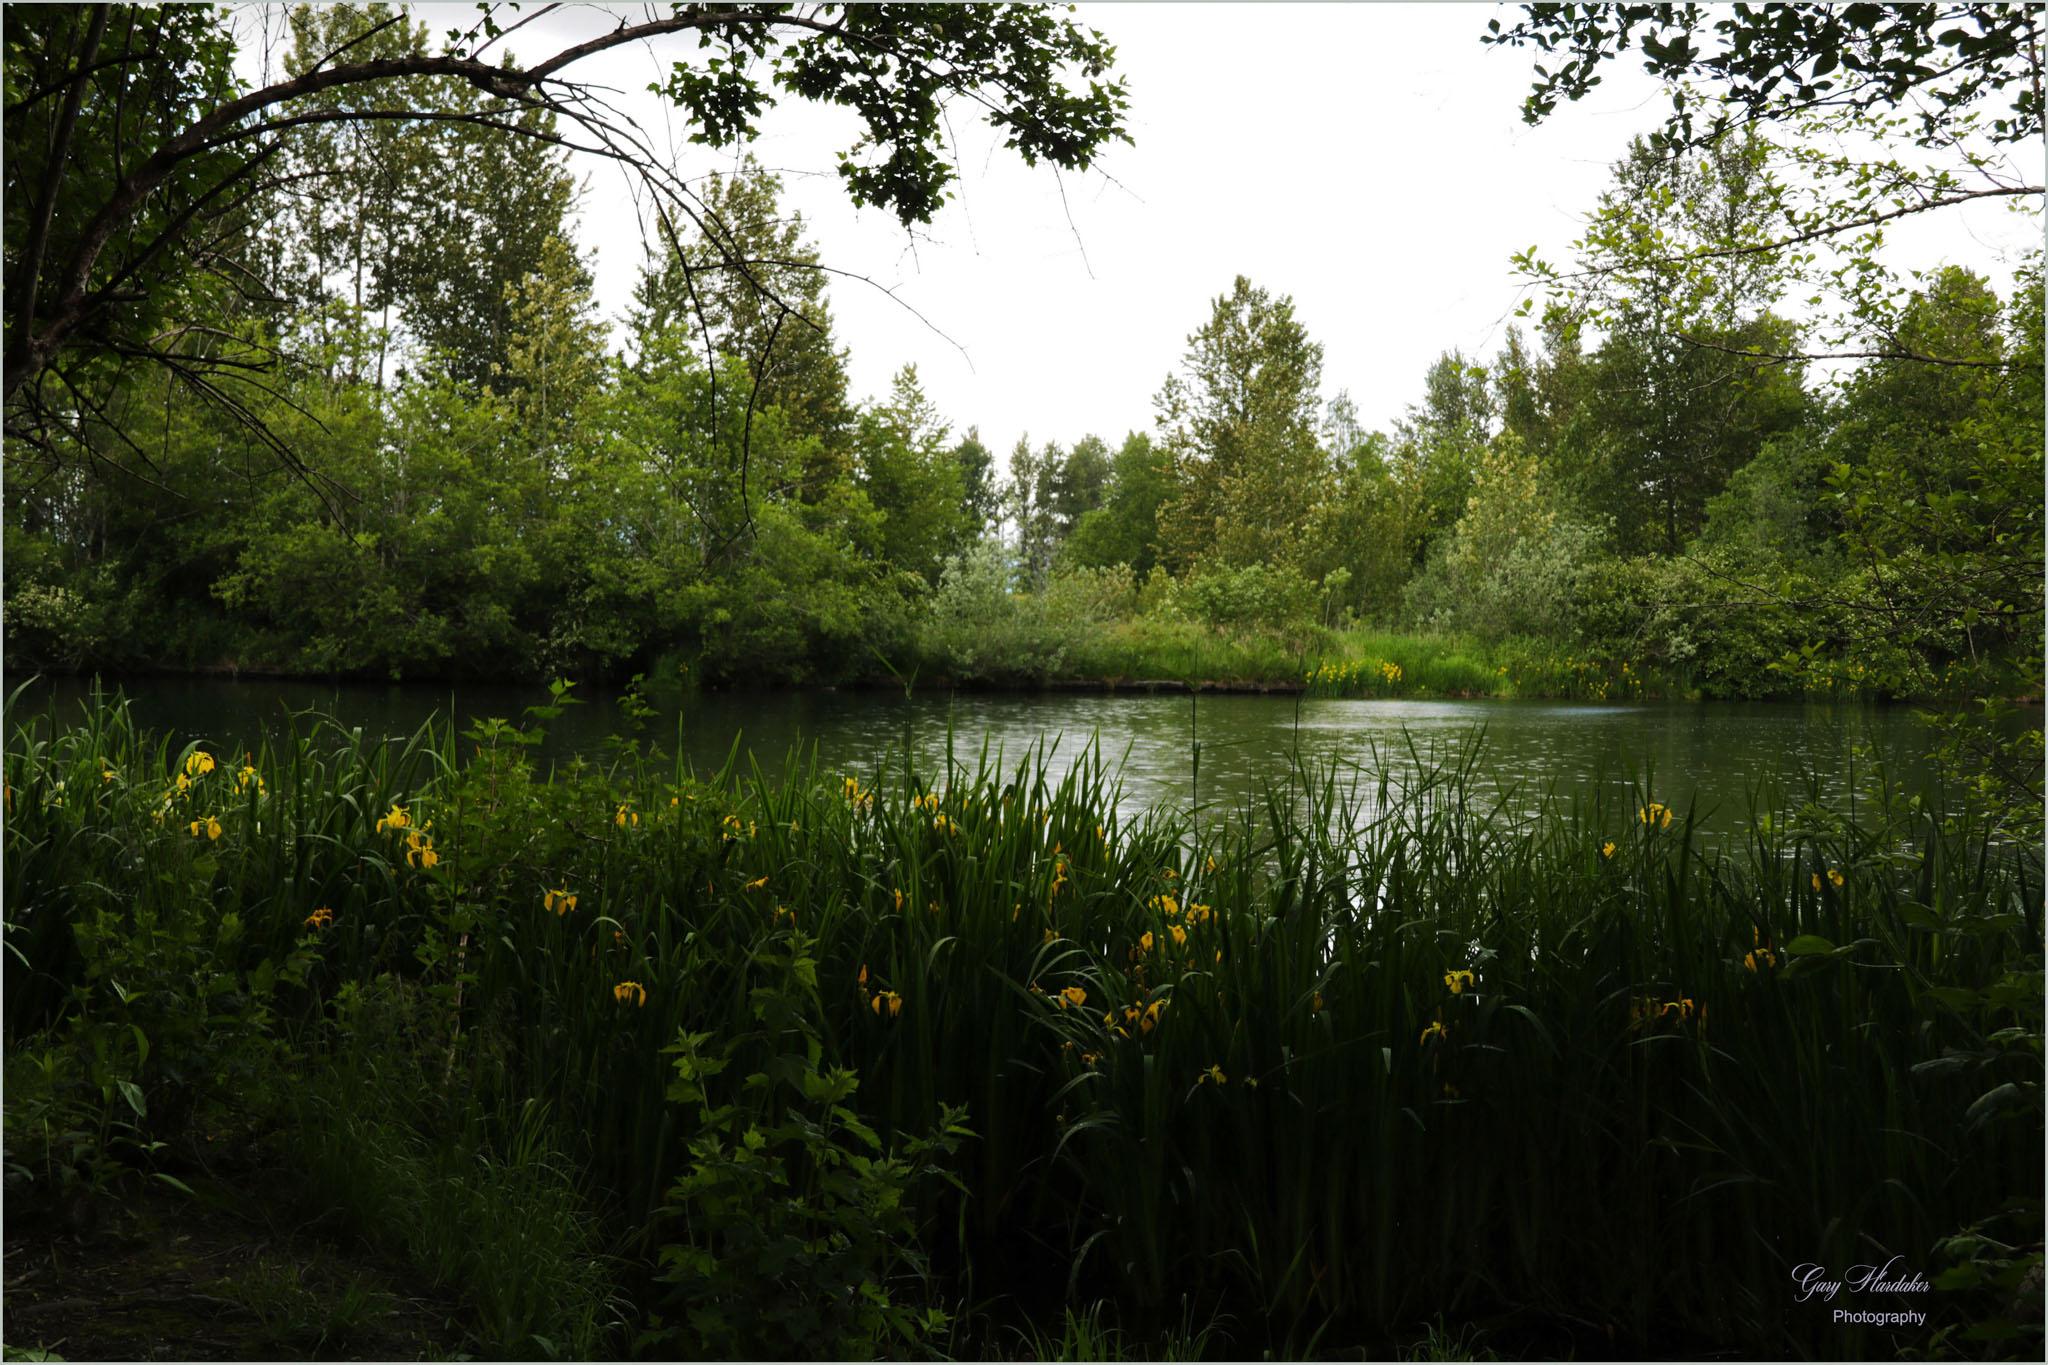 Slough (with yellow Irises) at Heron Sanctuary